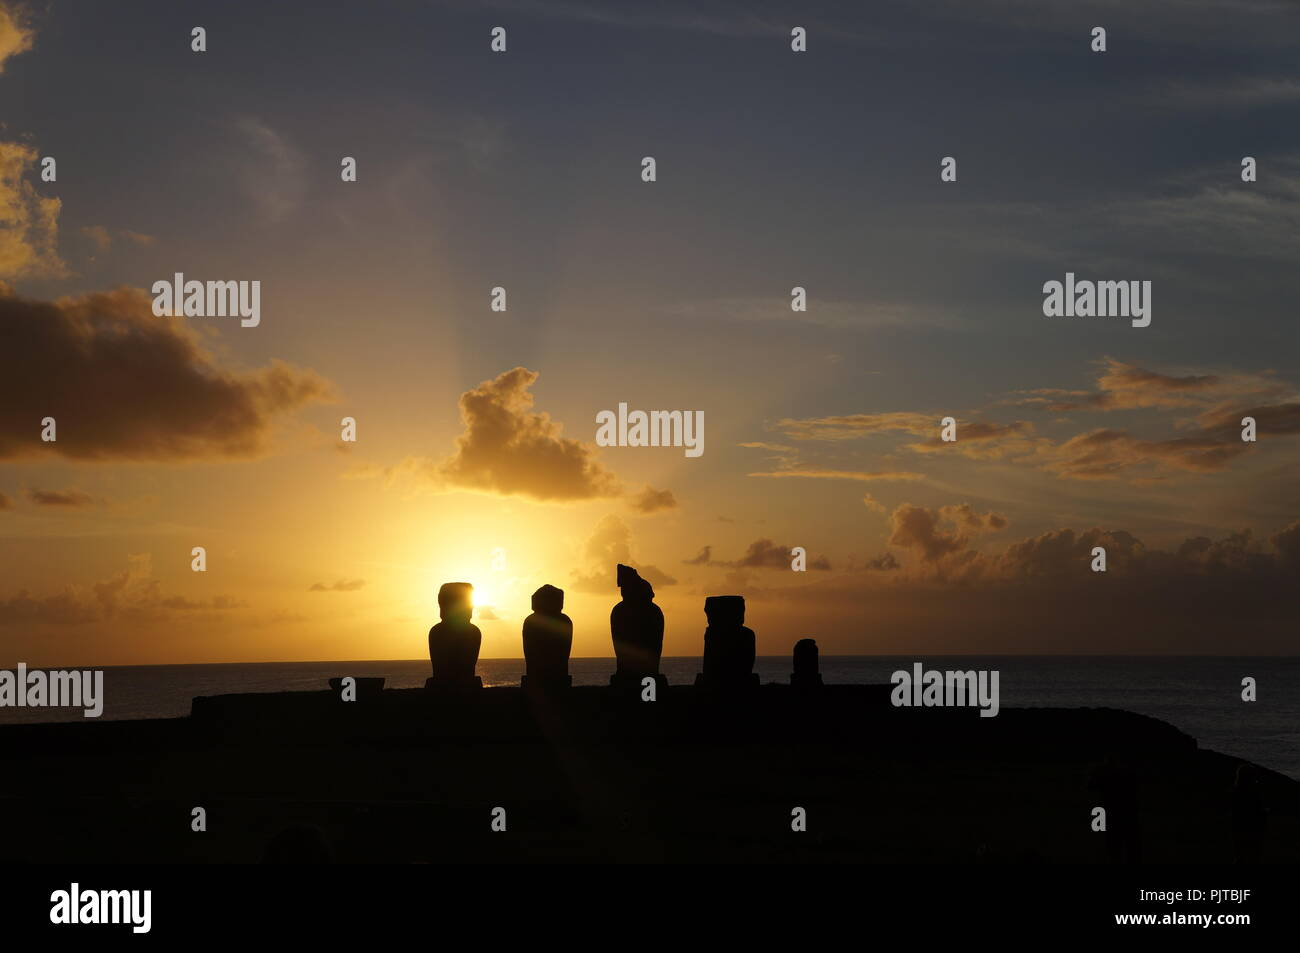 Sonnenuntergang über der Moai am Ahu Tahai, Osterinsel (Rapa Nui), Chile Stockbild